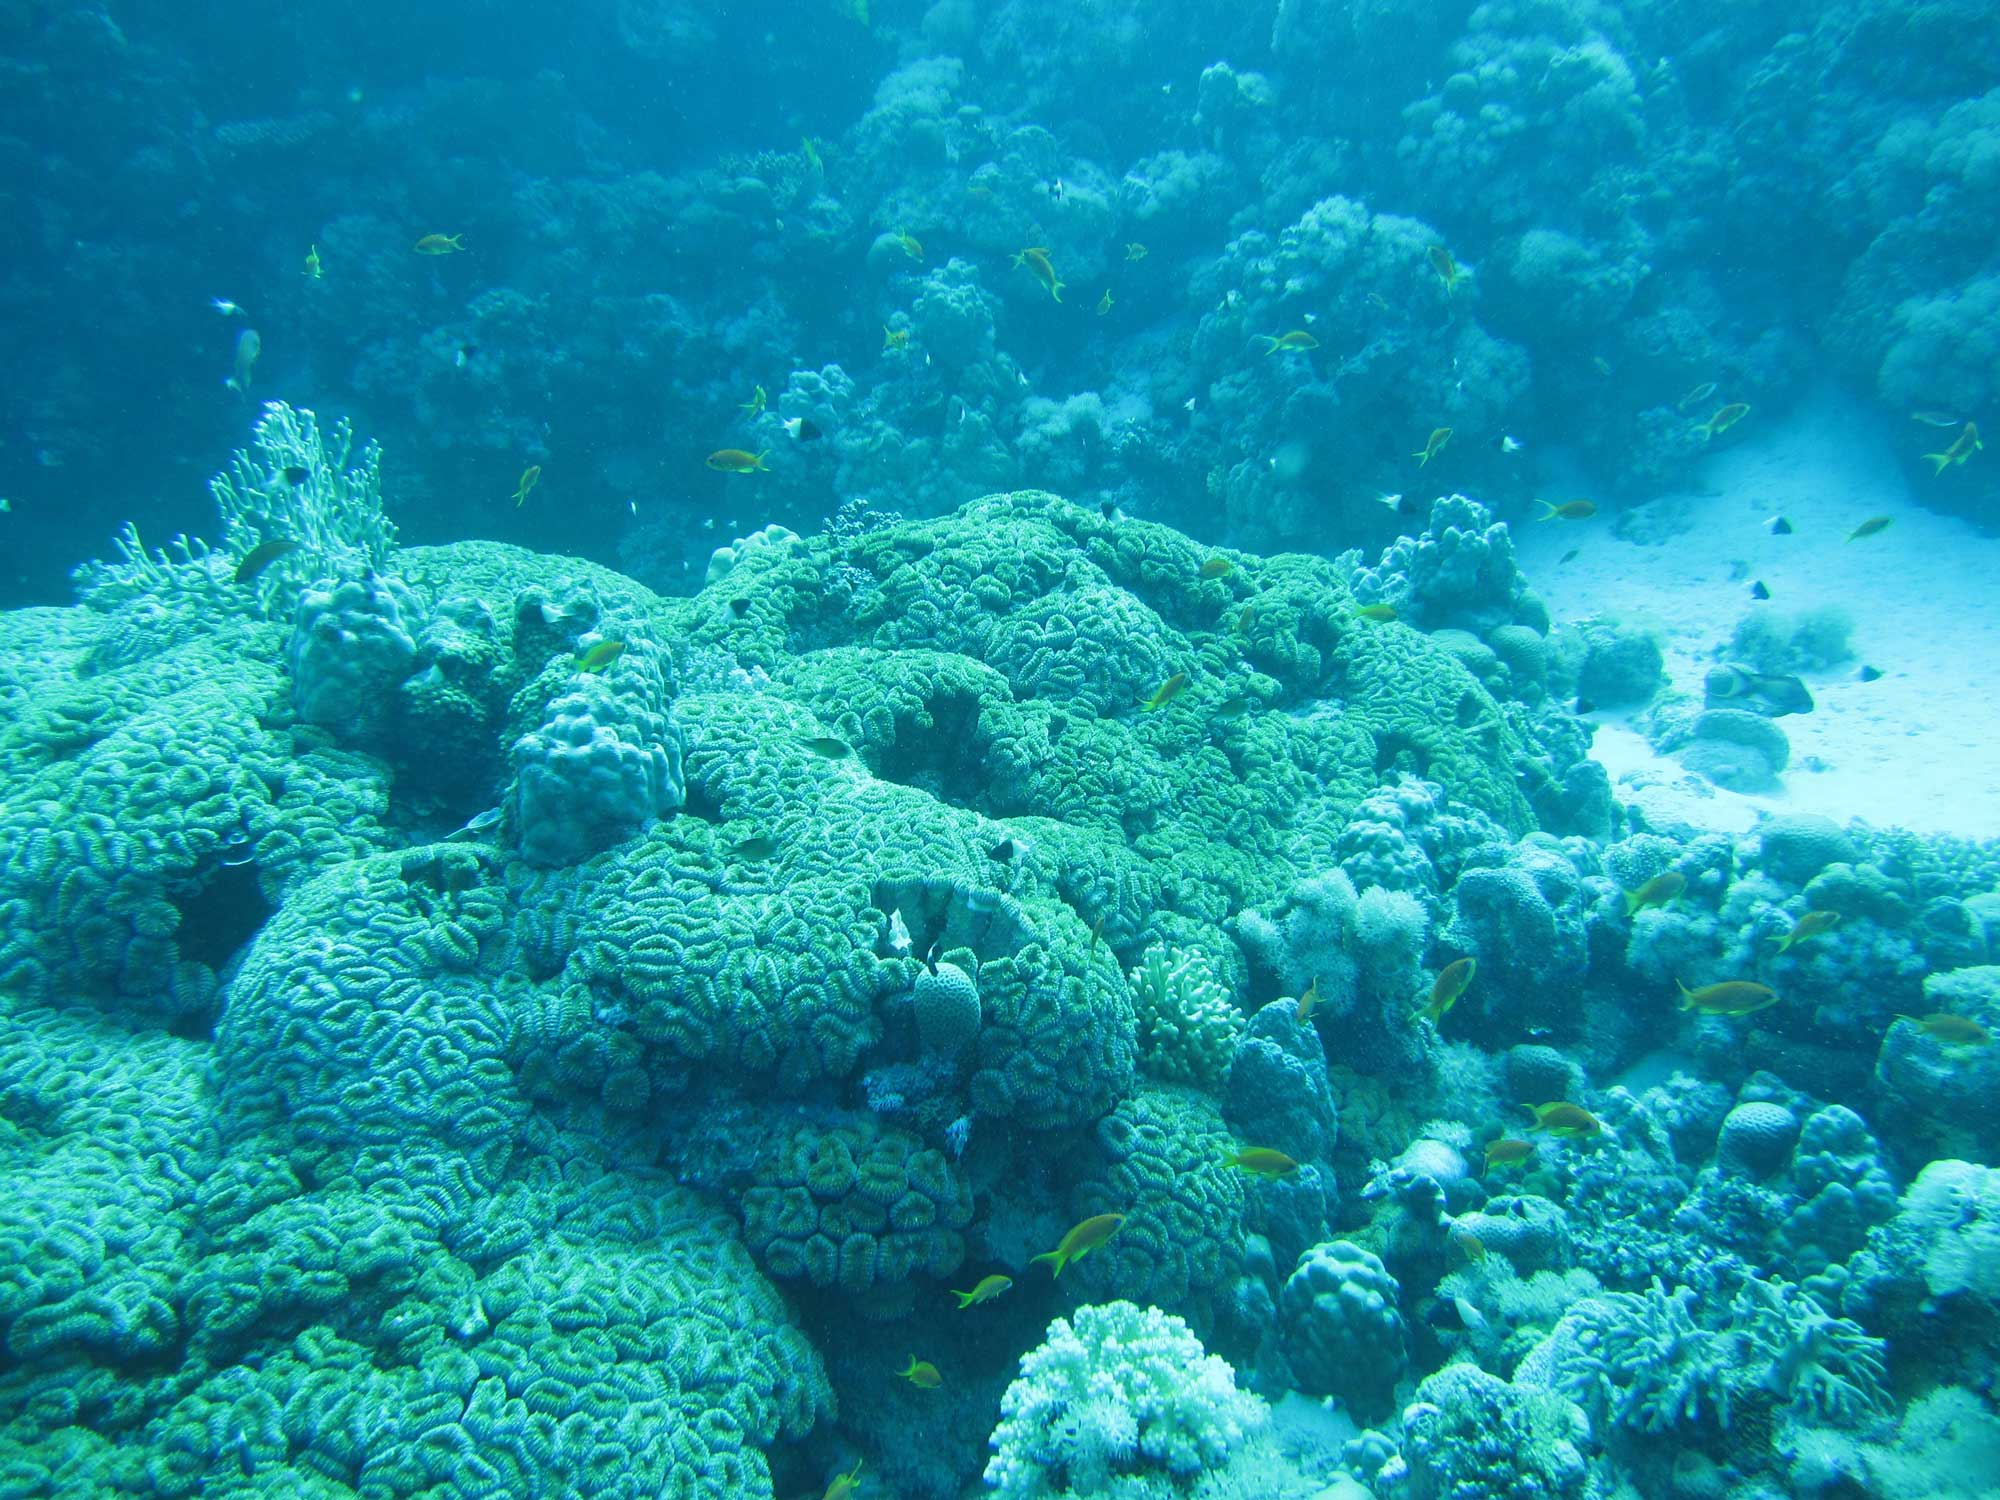 Coral reef at Cuba's Parque Nacional Peninsula de Guanahacabibes. Image credit: David Sherman